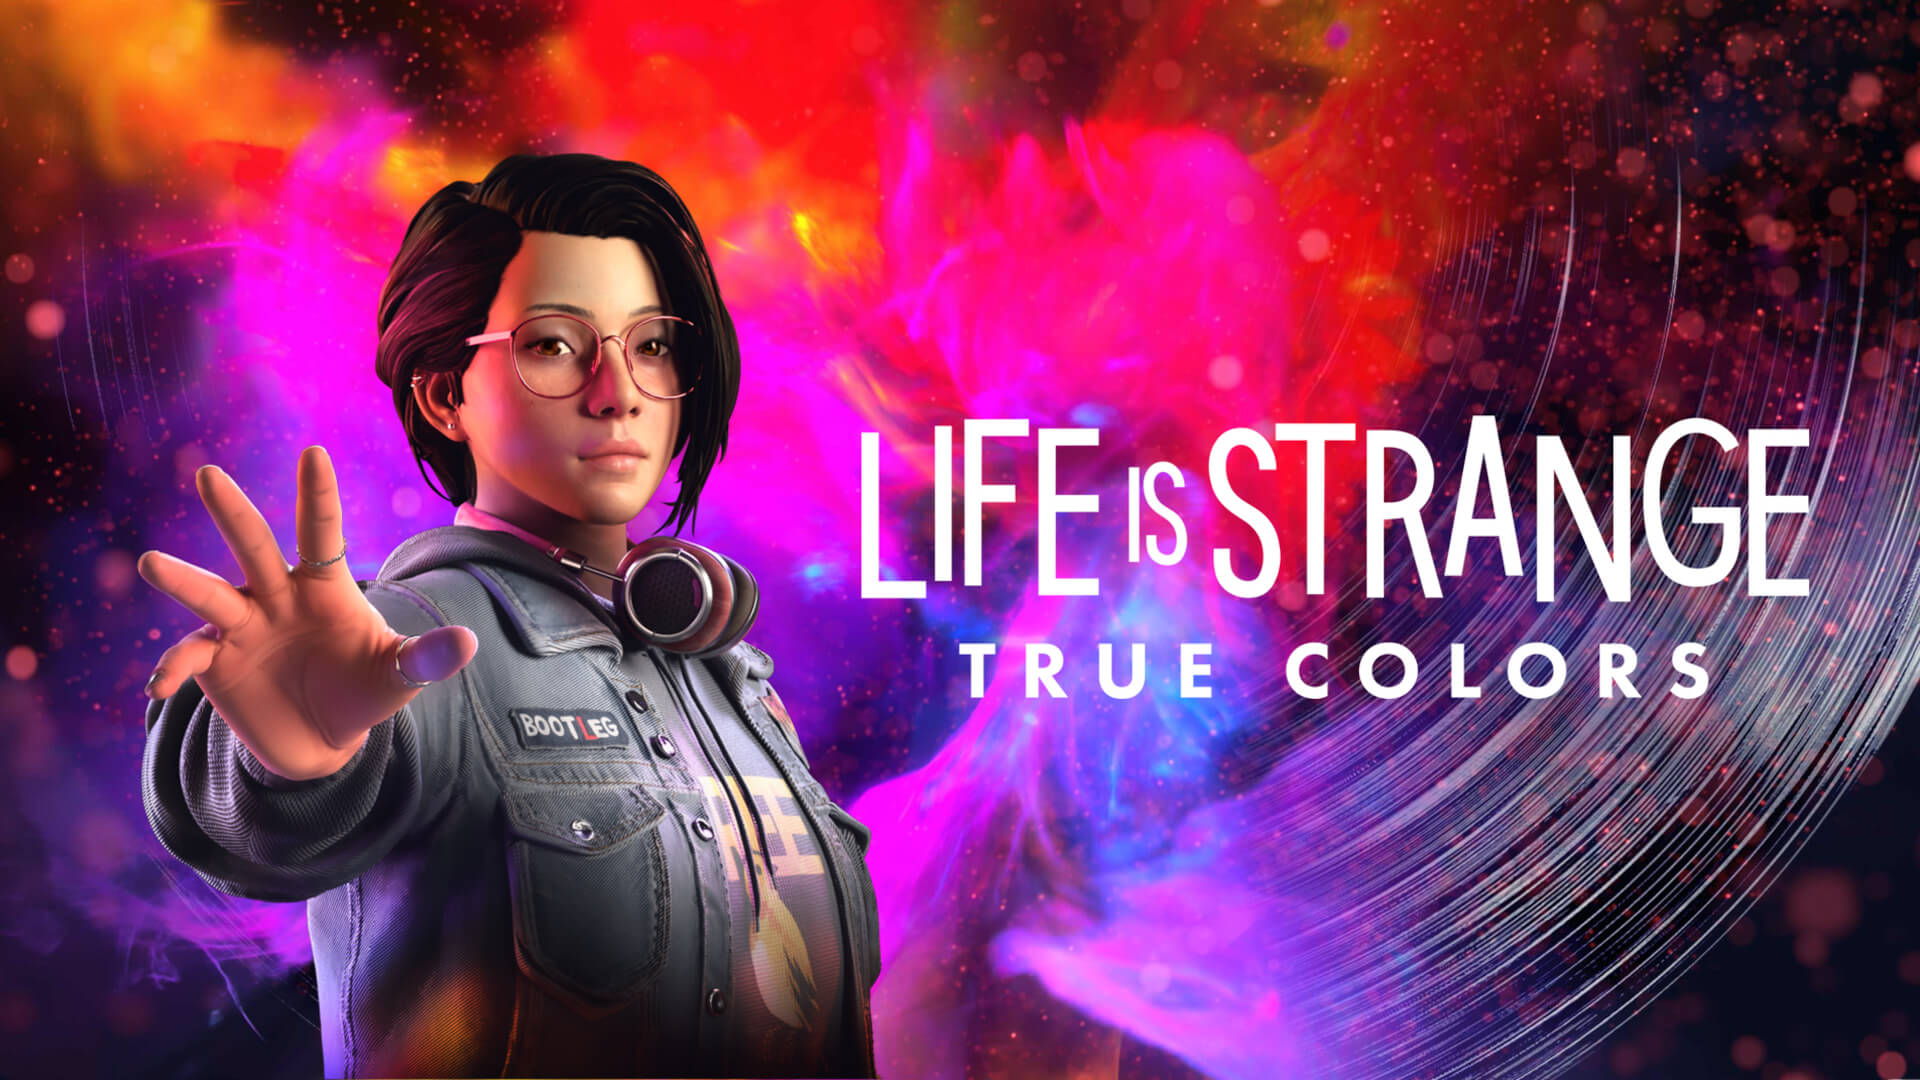 life-is-strange-true-colors-home